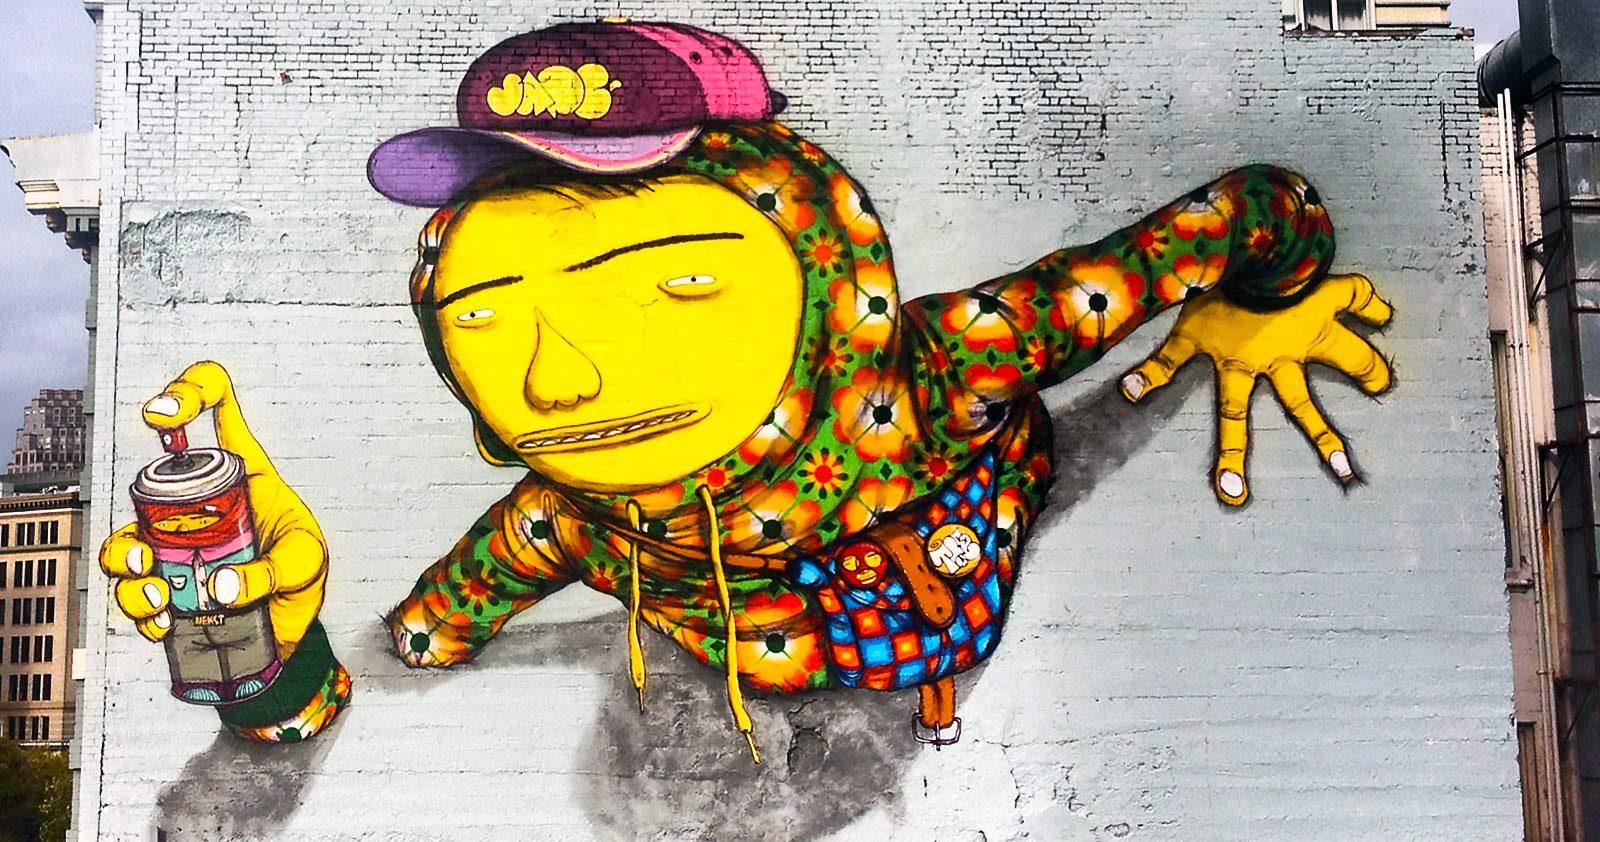 Pas de bombe, pas de graffiti !